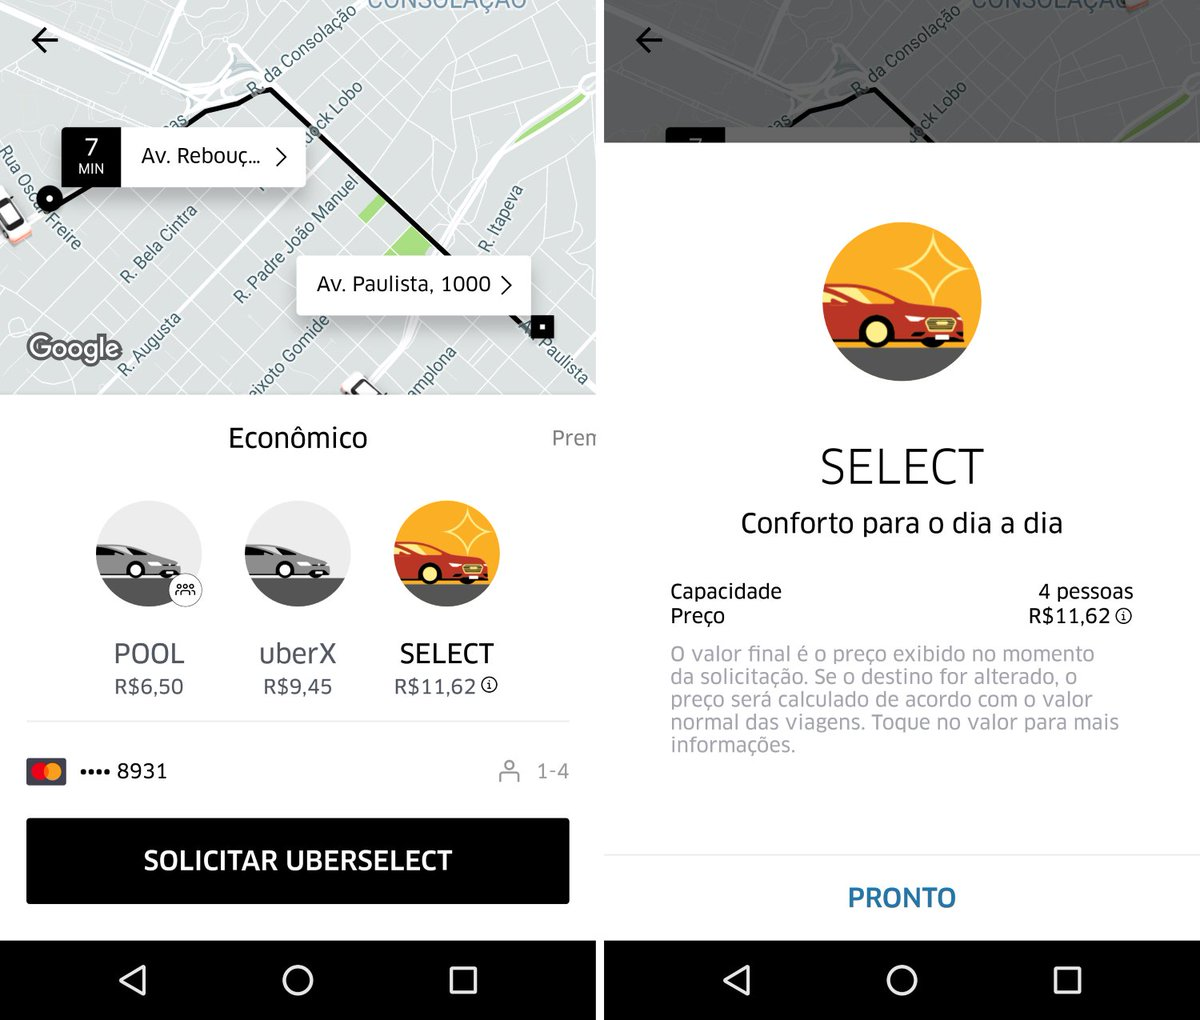 Comparamos os preços do UberX, UberSelect e concorrentes: https://t.co/LLuBfW2za2